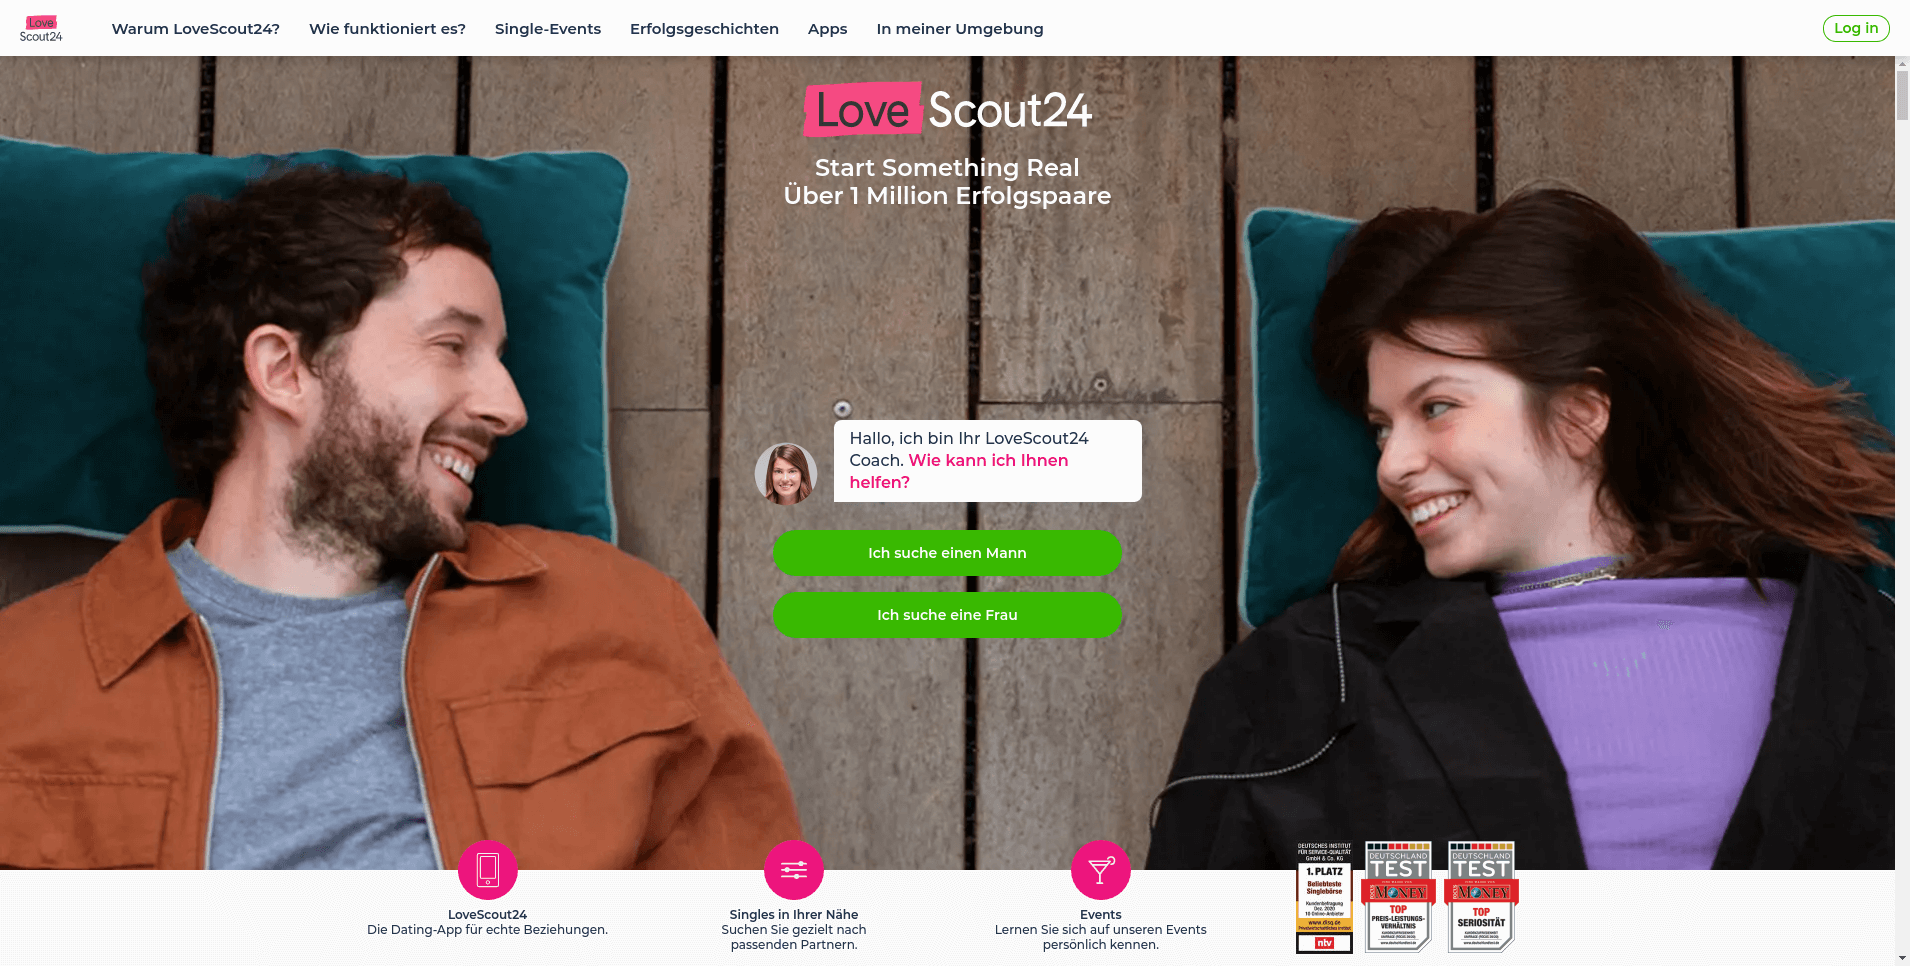 Lovescout24 profil löschen